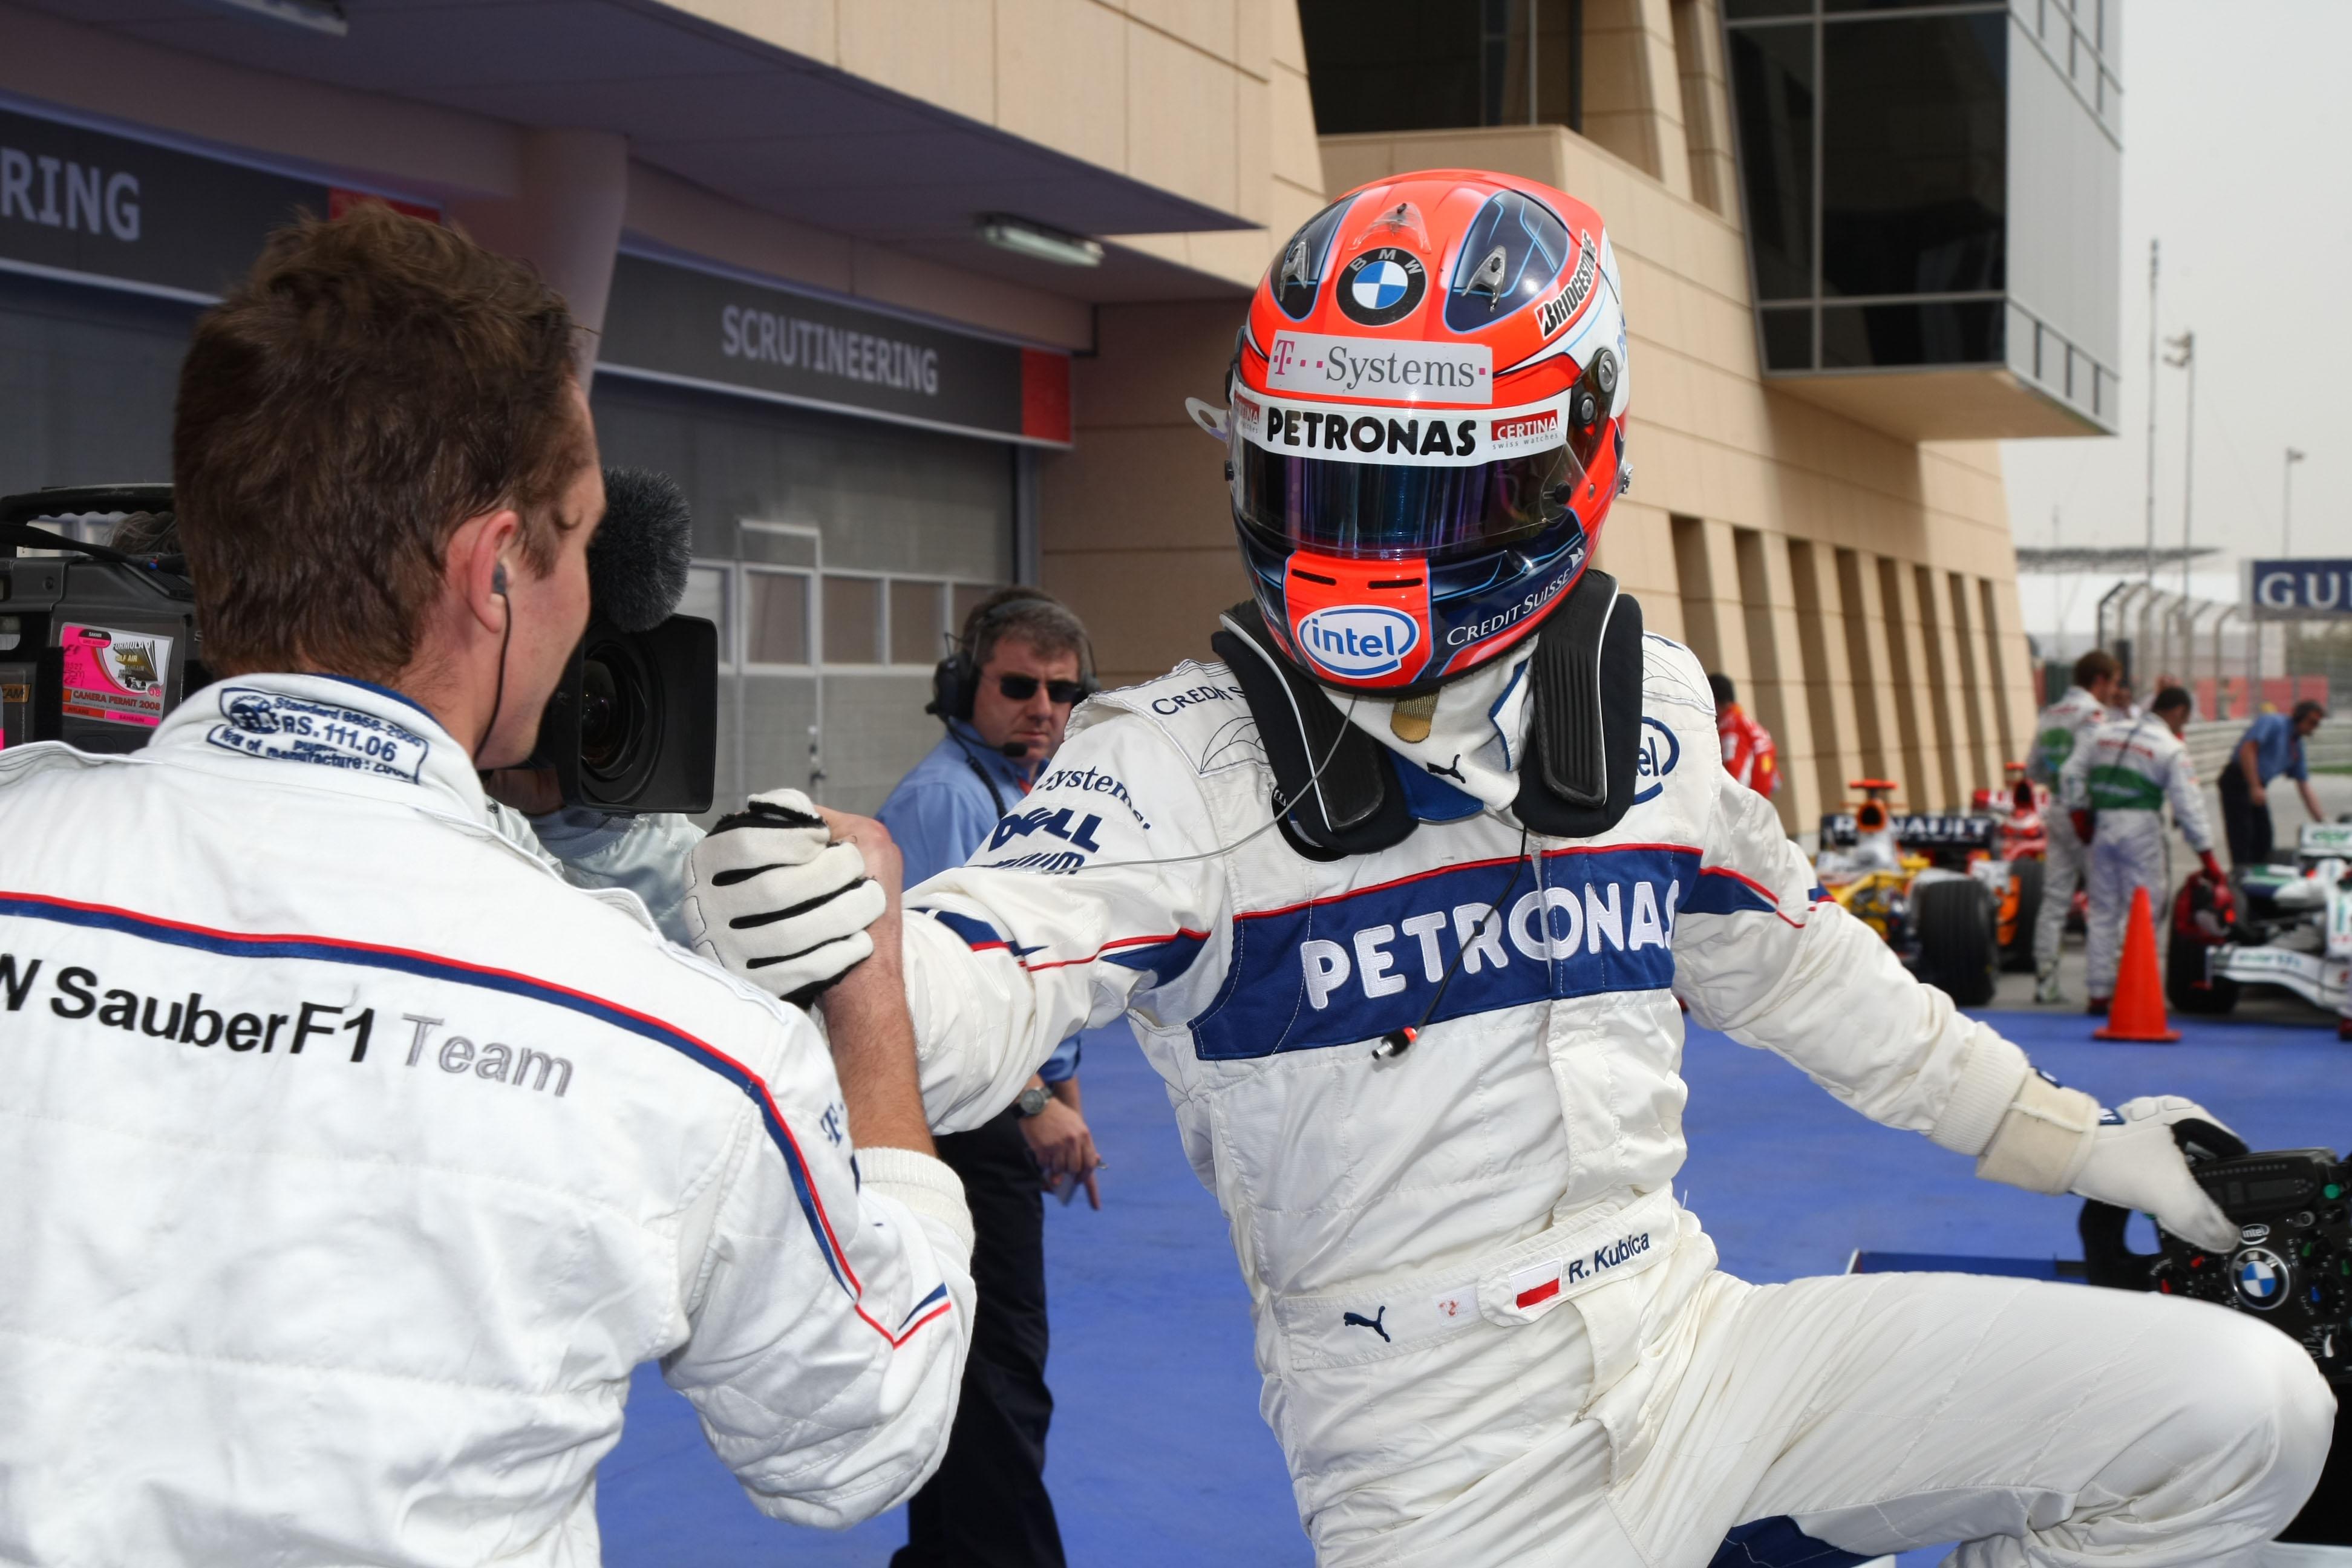 Robert Kubica, BMW Sauber, Bahrain 2008, F1